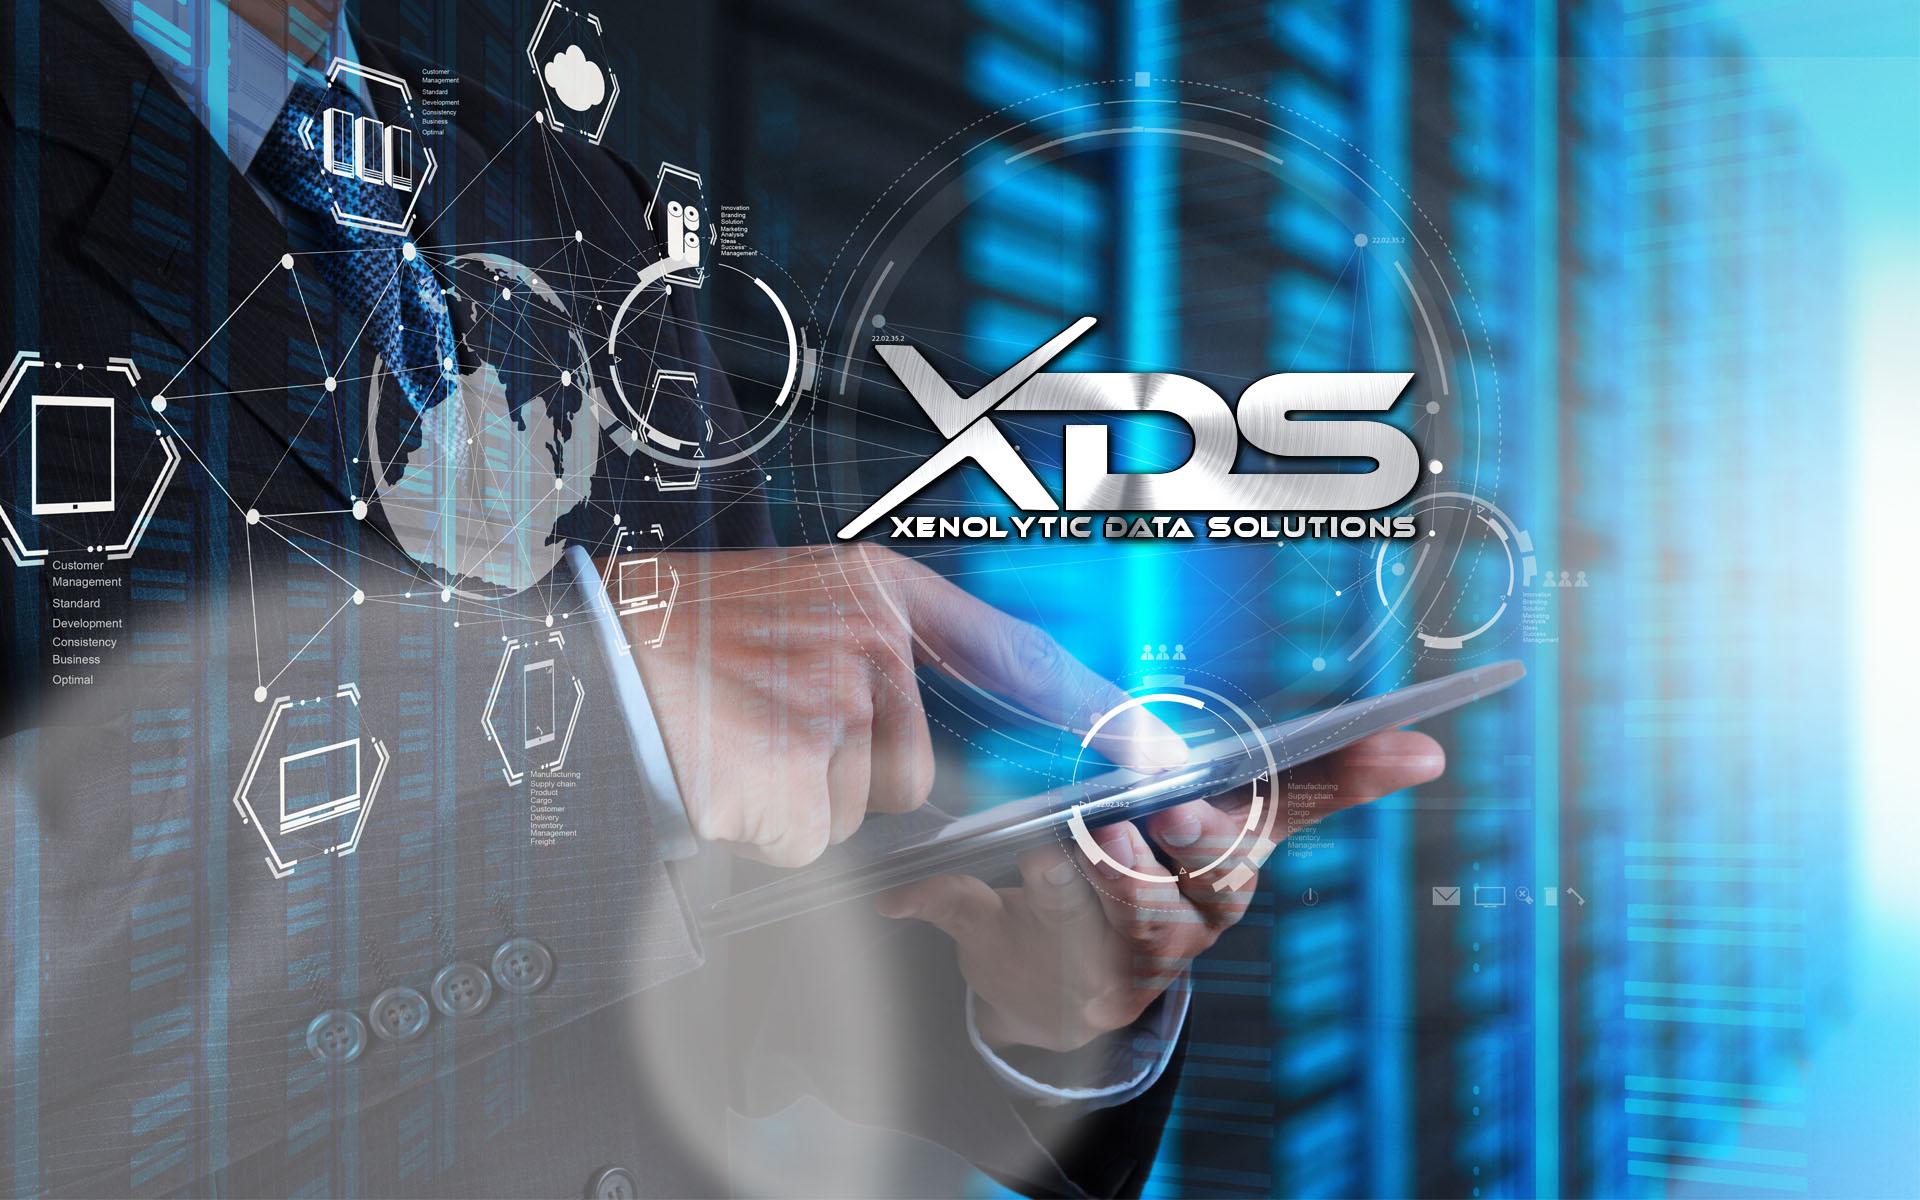 XDSblue_TechSolutions_1920x1200x72dpi